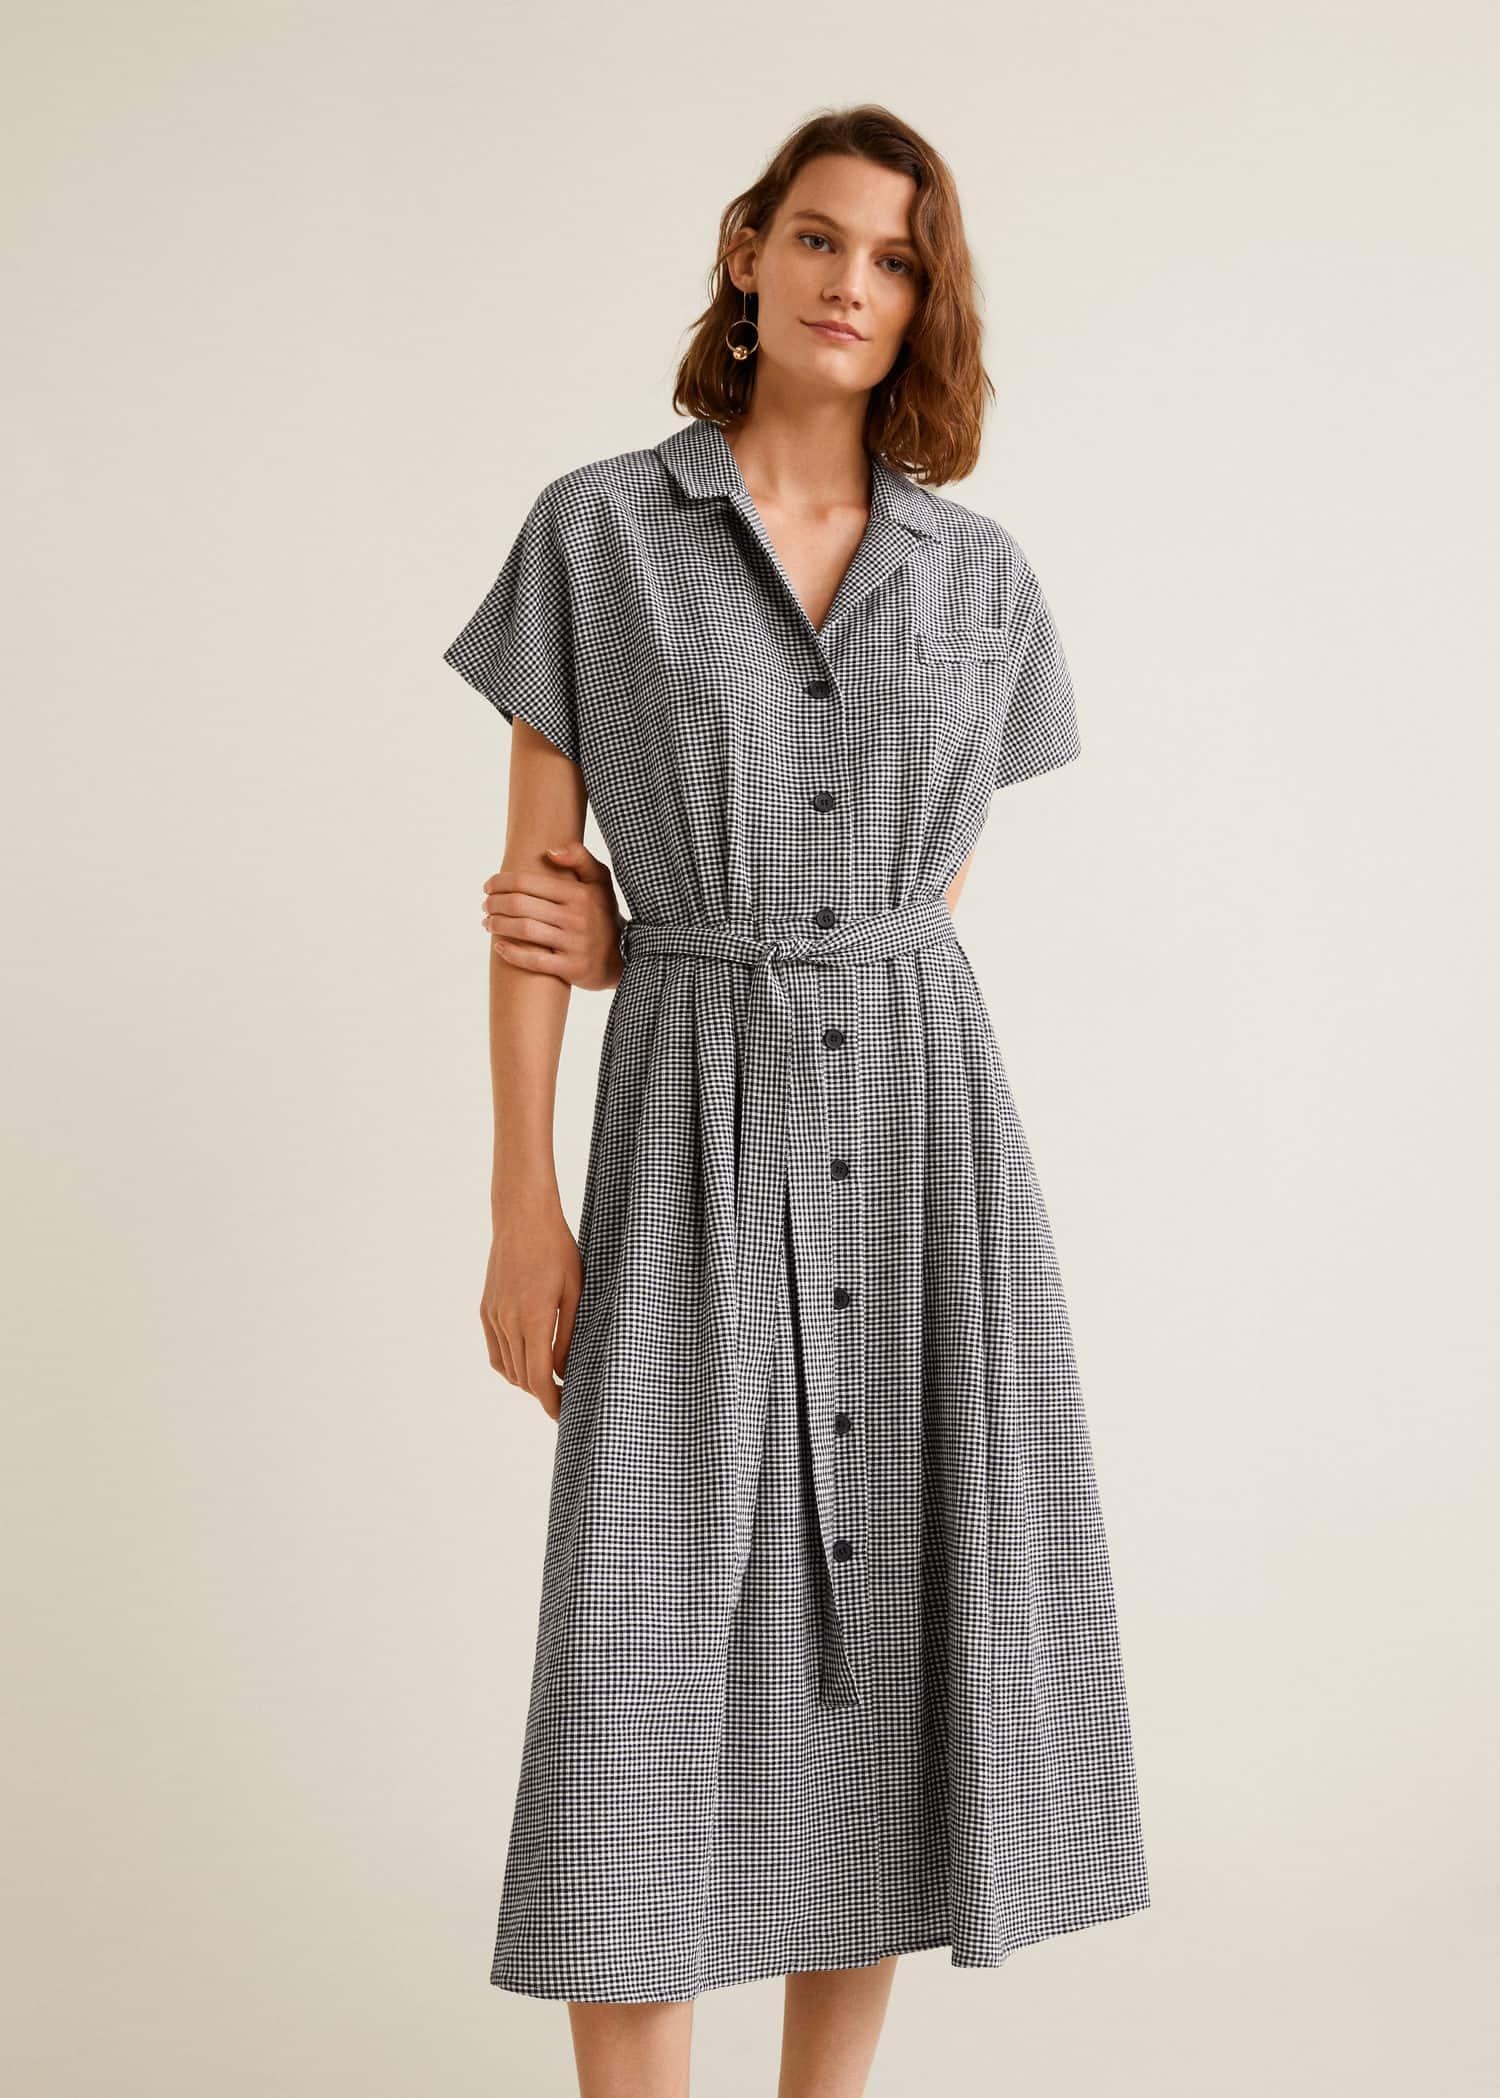 Robe coton vichy Femme   Mango France